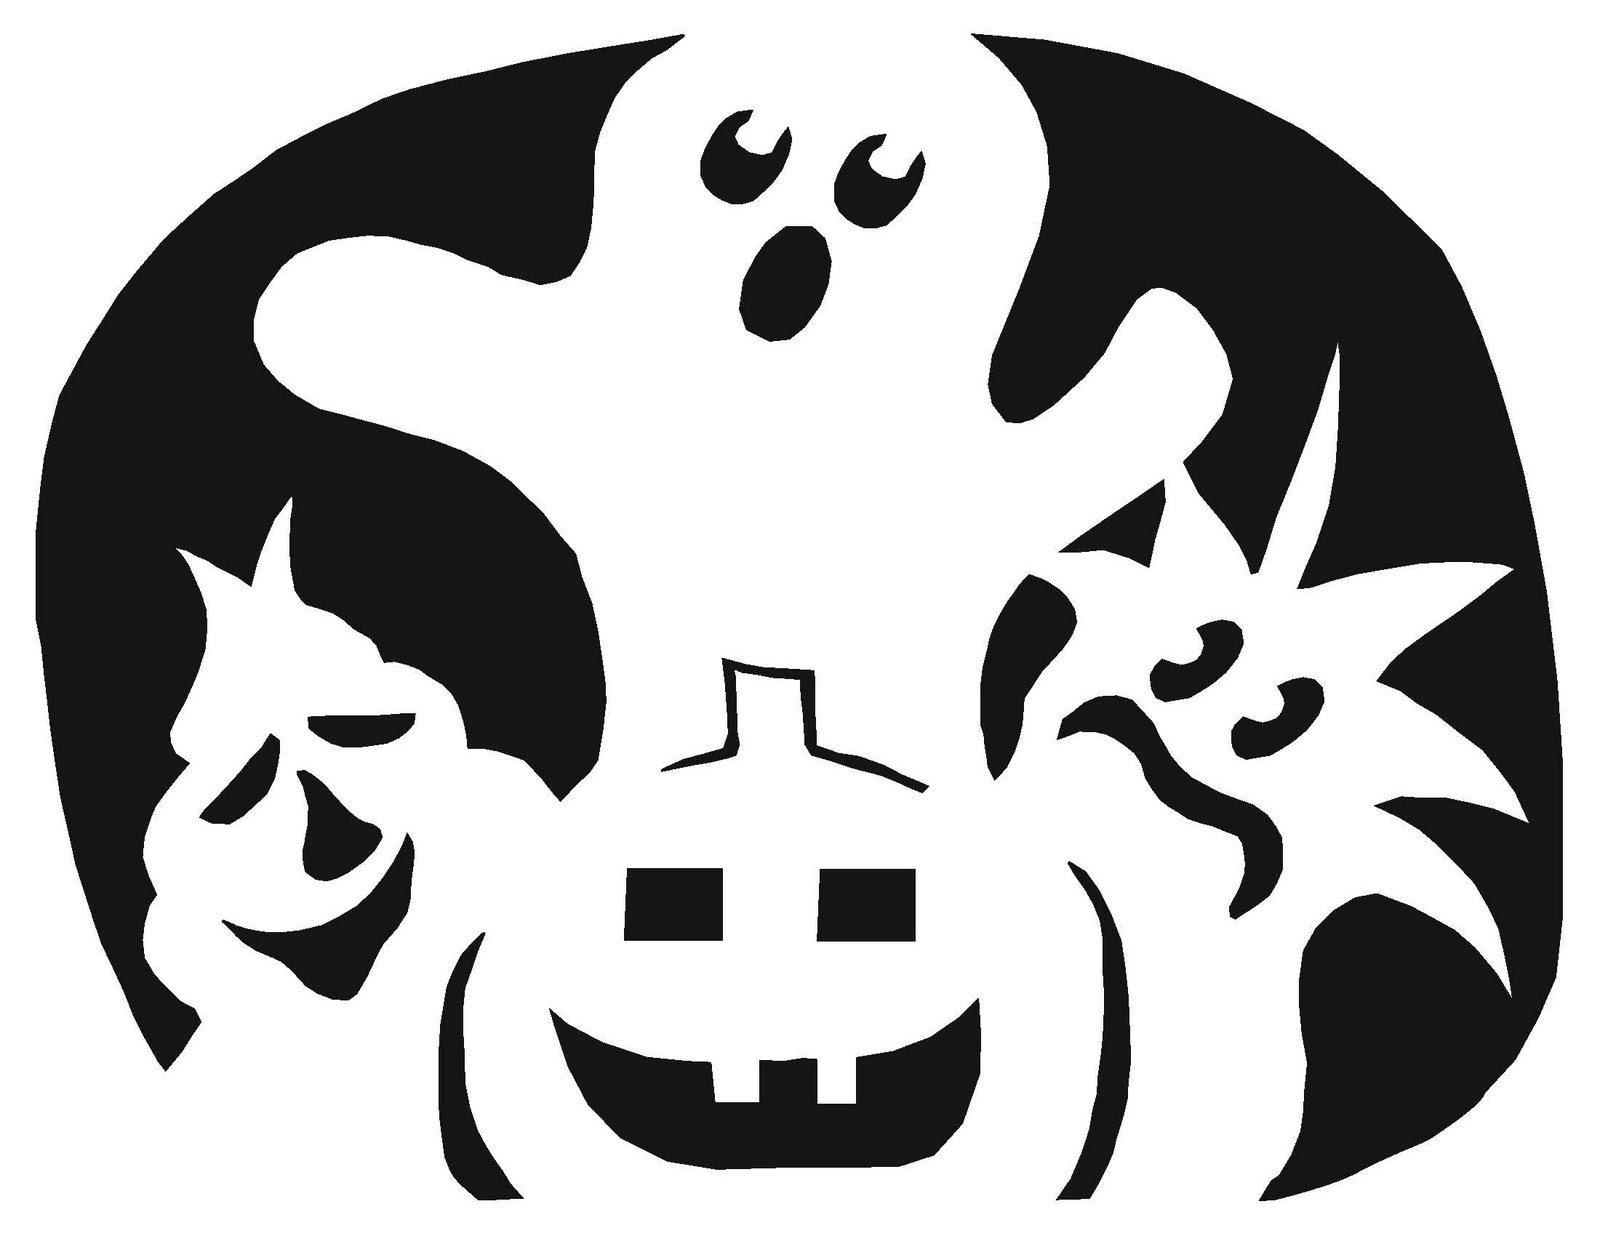 Free Guitar Pumpkin Stencil, Download Free Clip Art, Free Clip Art - Free Printable Pumpkin Templates